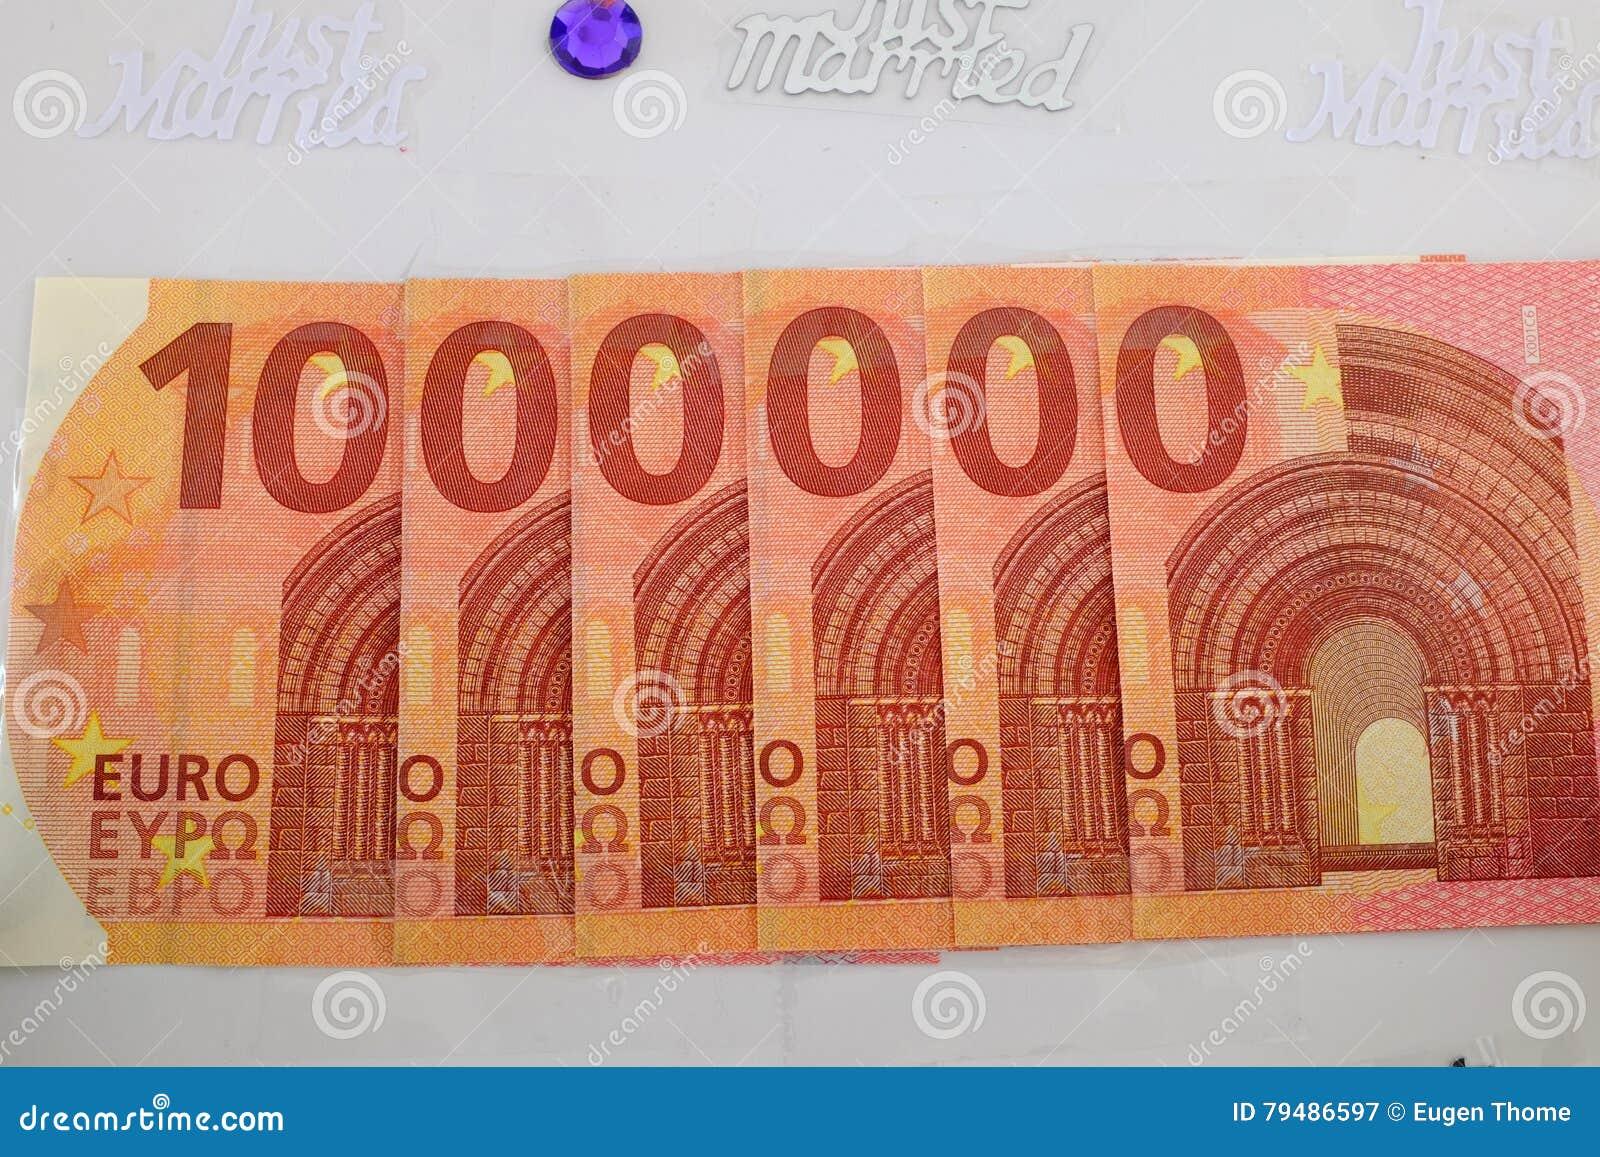 1 million euros stock image. Image of idea, folded, figure ...